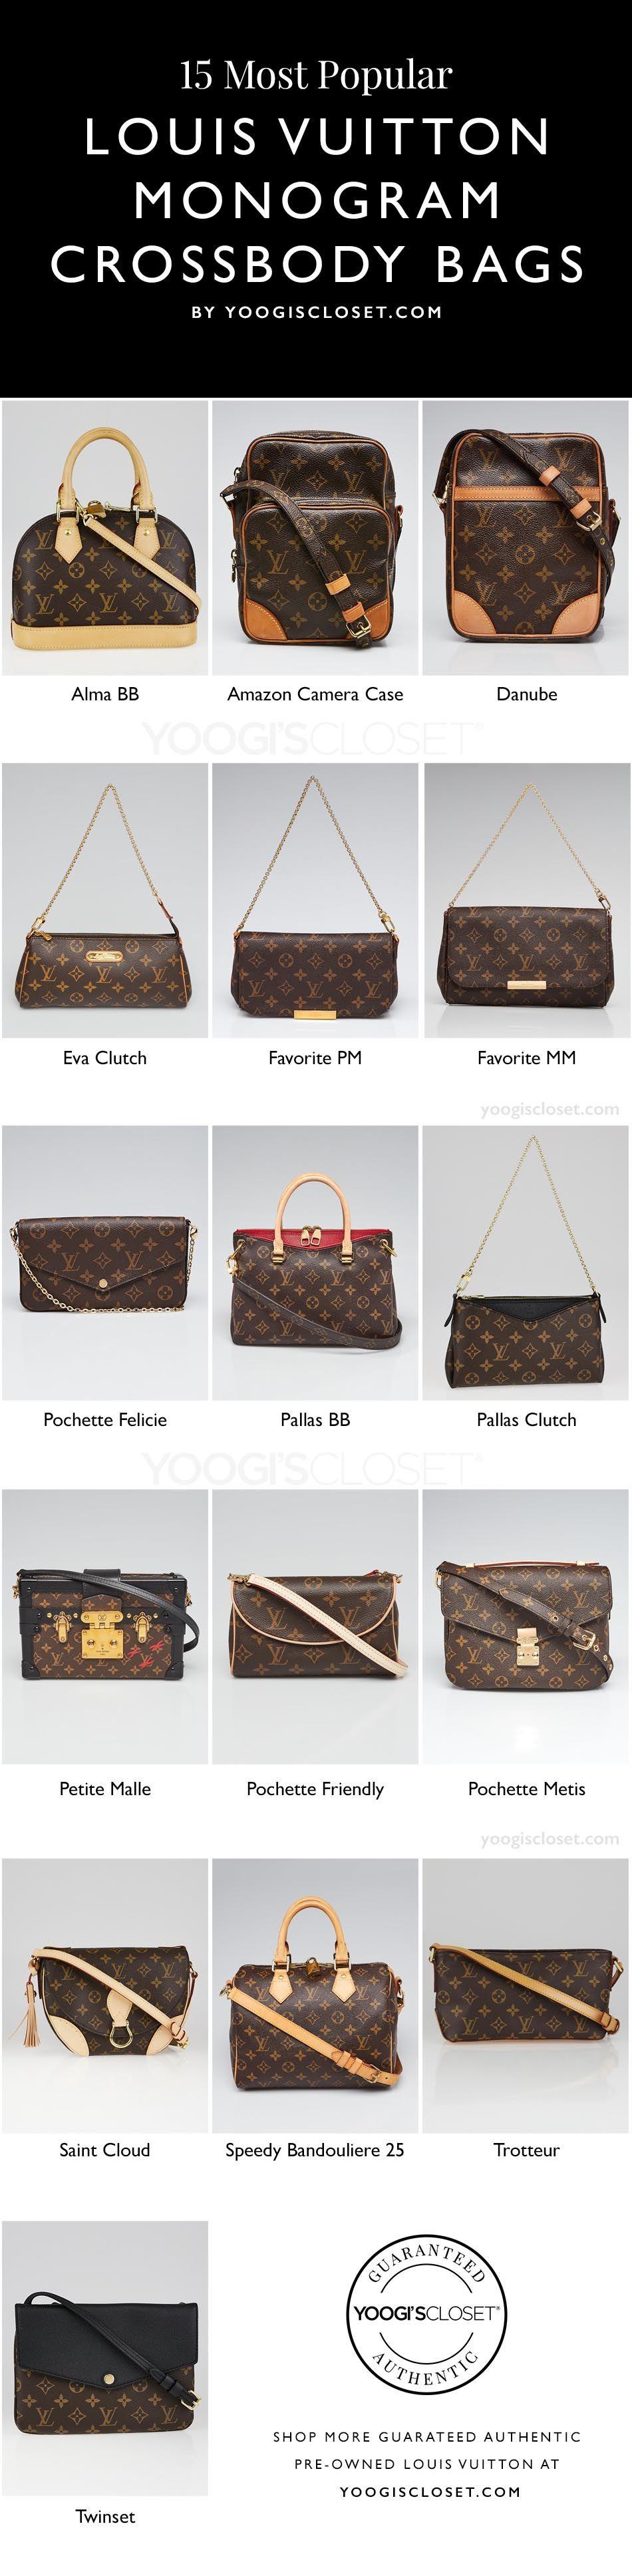 15 Most Popular Louis Vuitton Monogram Small Crossbody Bags Monogram Crossbody Bag Louis Vuitton Crossbody Bag Small Crossbody Bag